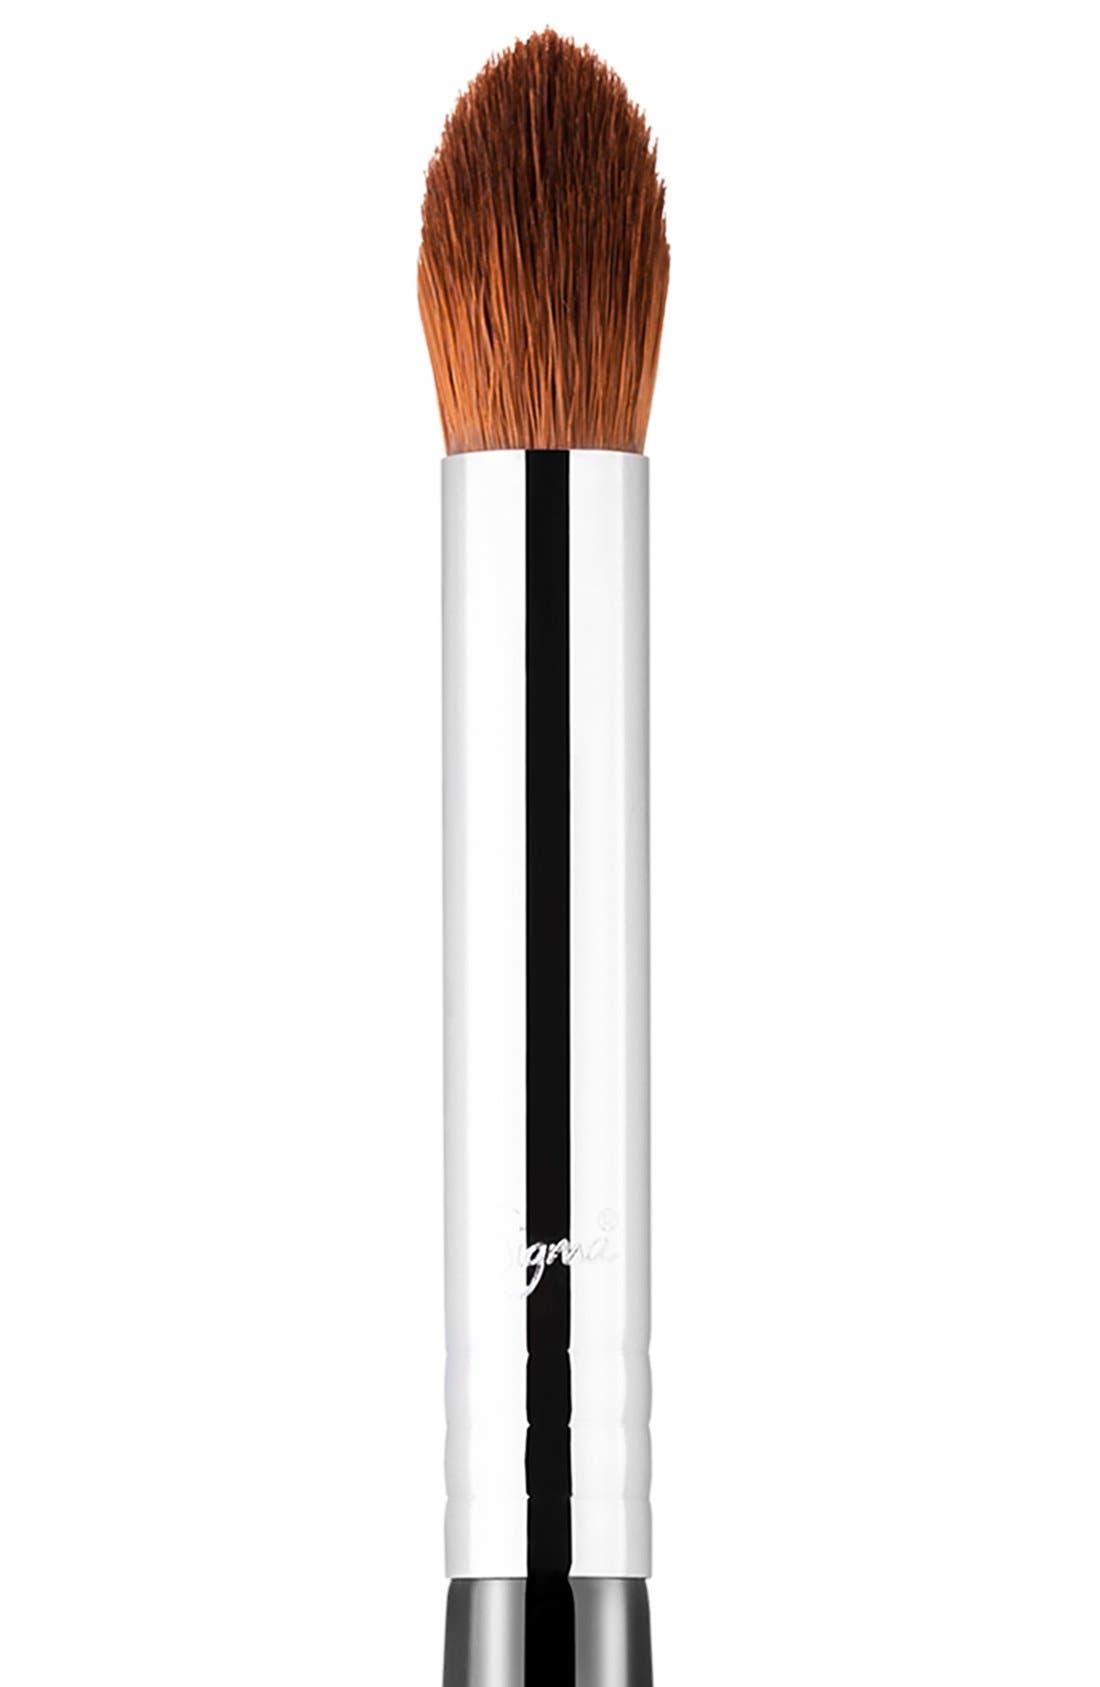 E44 Firm Blender Brush,                             Alternate thumbnail 2, color,                             NO COLOR